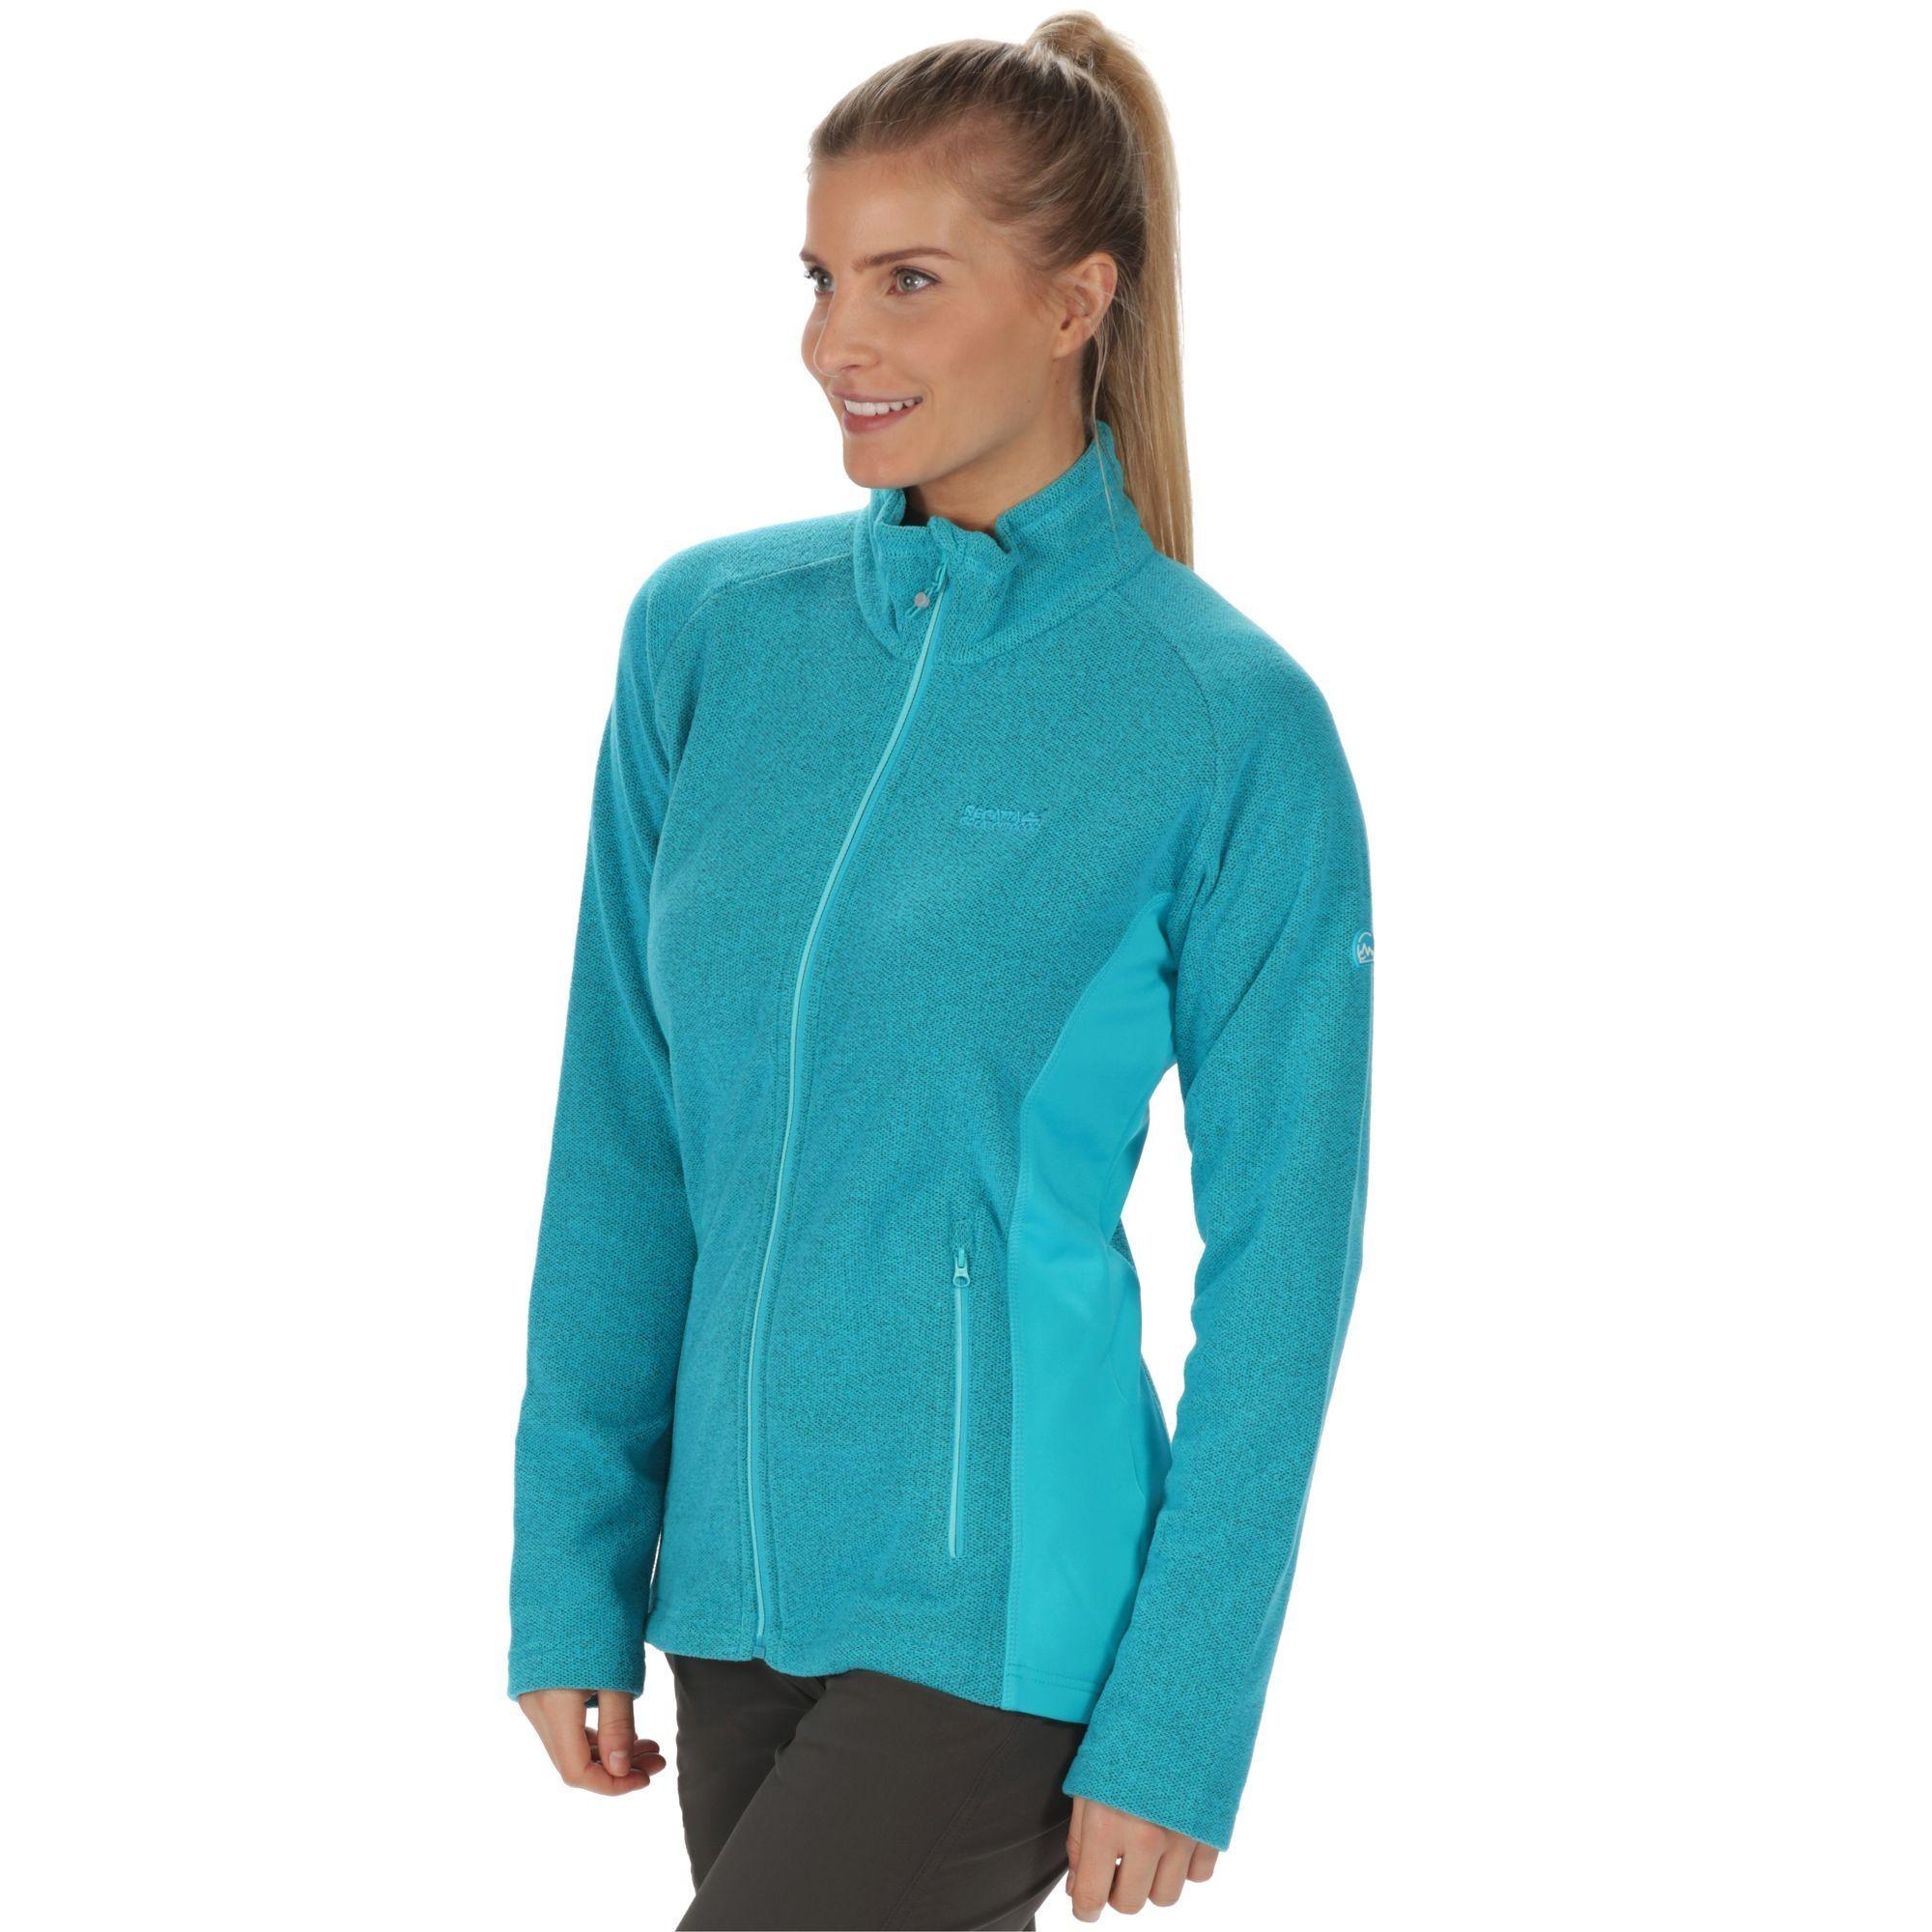 Details about Regatta WomensLadies Tafton Fleece Jacket (RG3098)